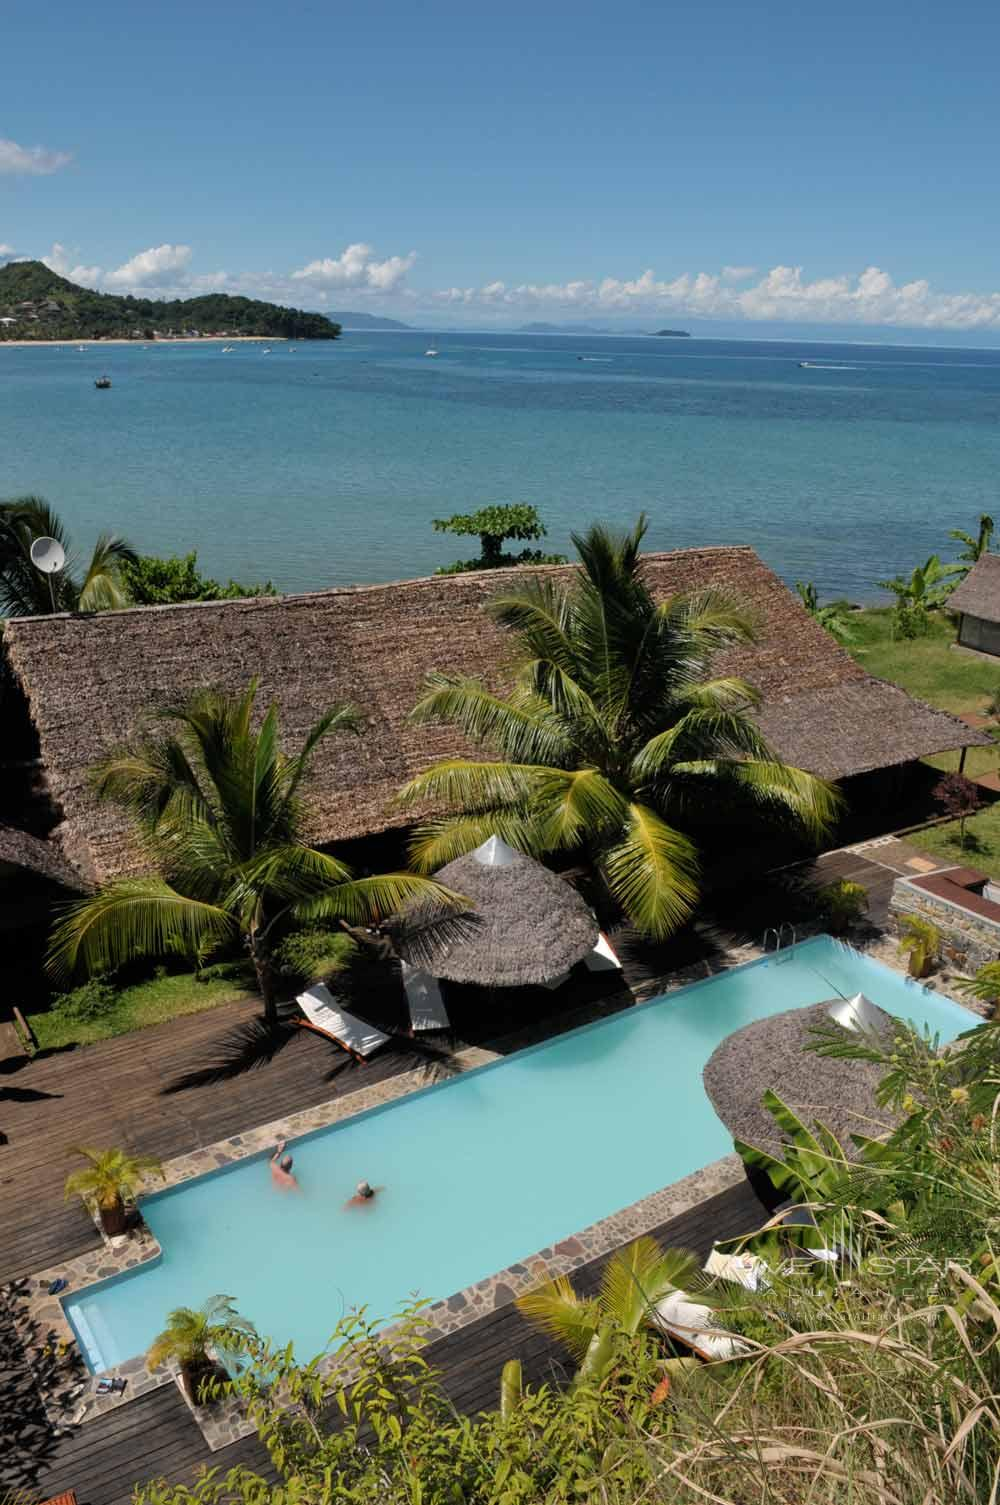 Freshwater Pool at LHeure Bleue Hotel, Madagascar